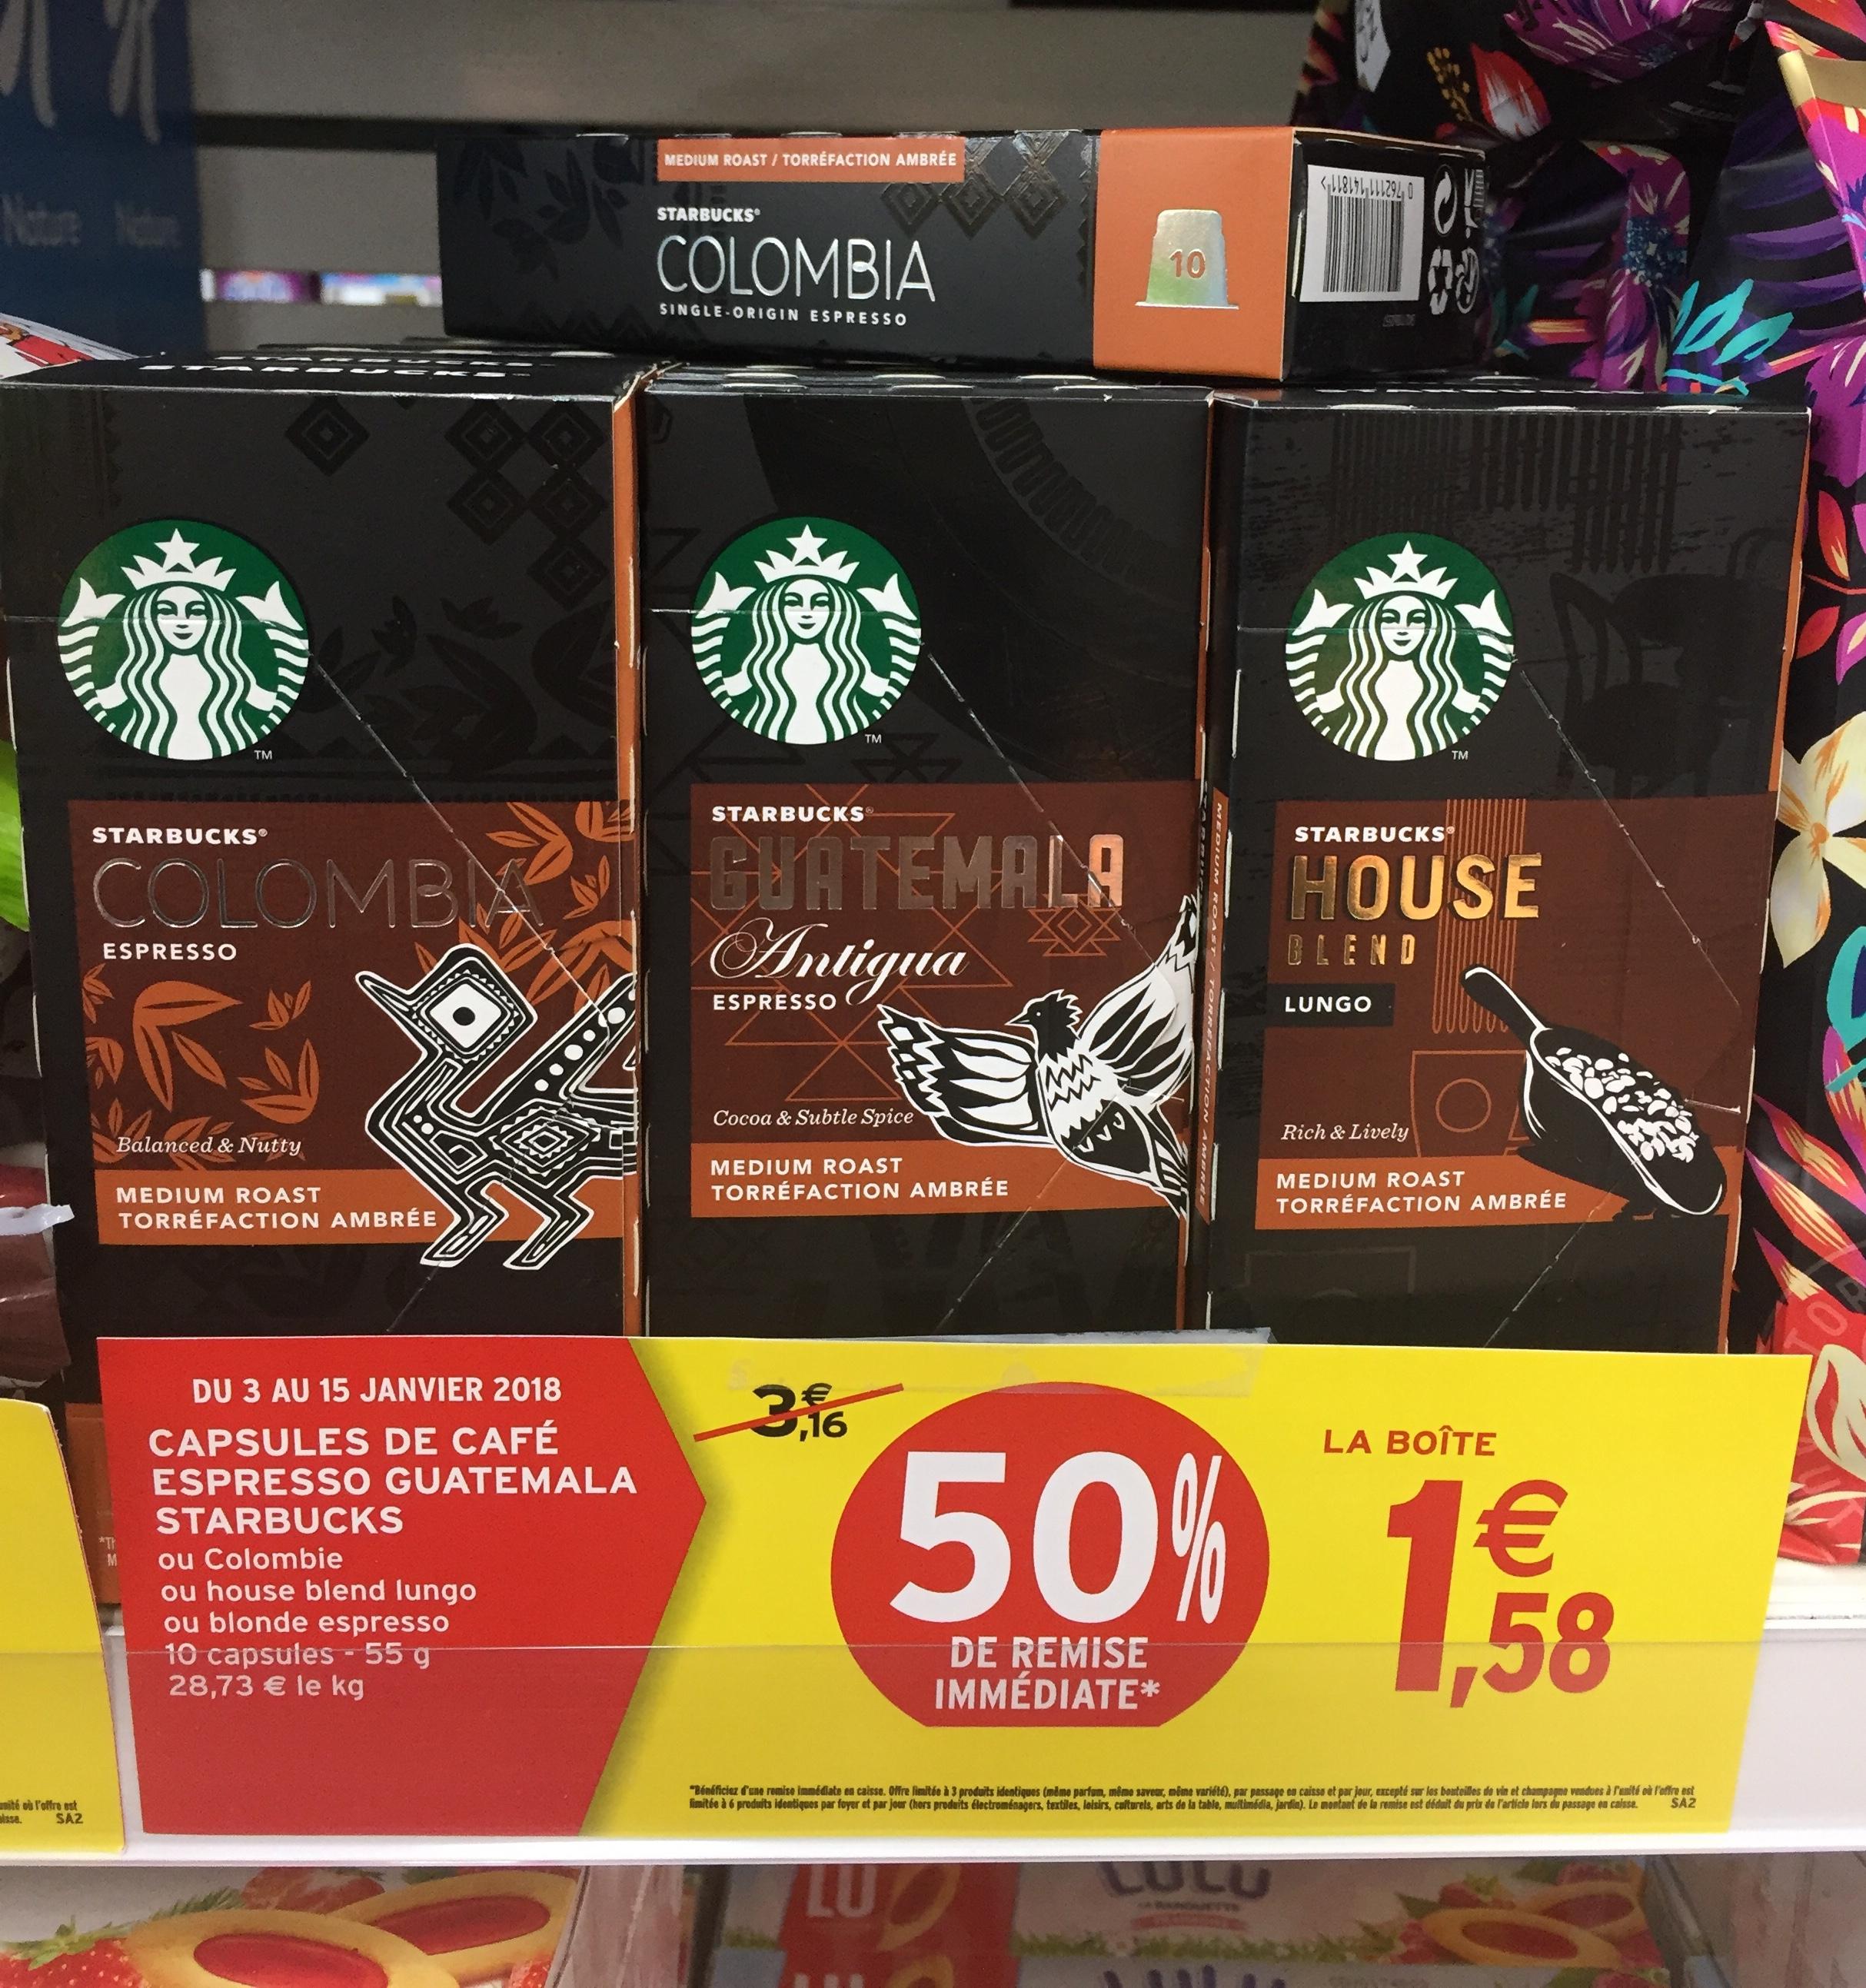 Starbucks 10 capsules en aluminium de café compatibles Nespresso